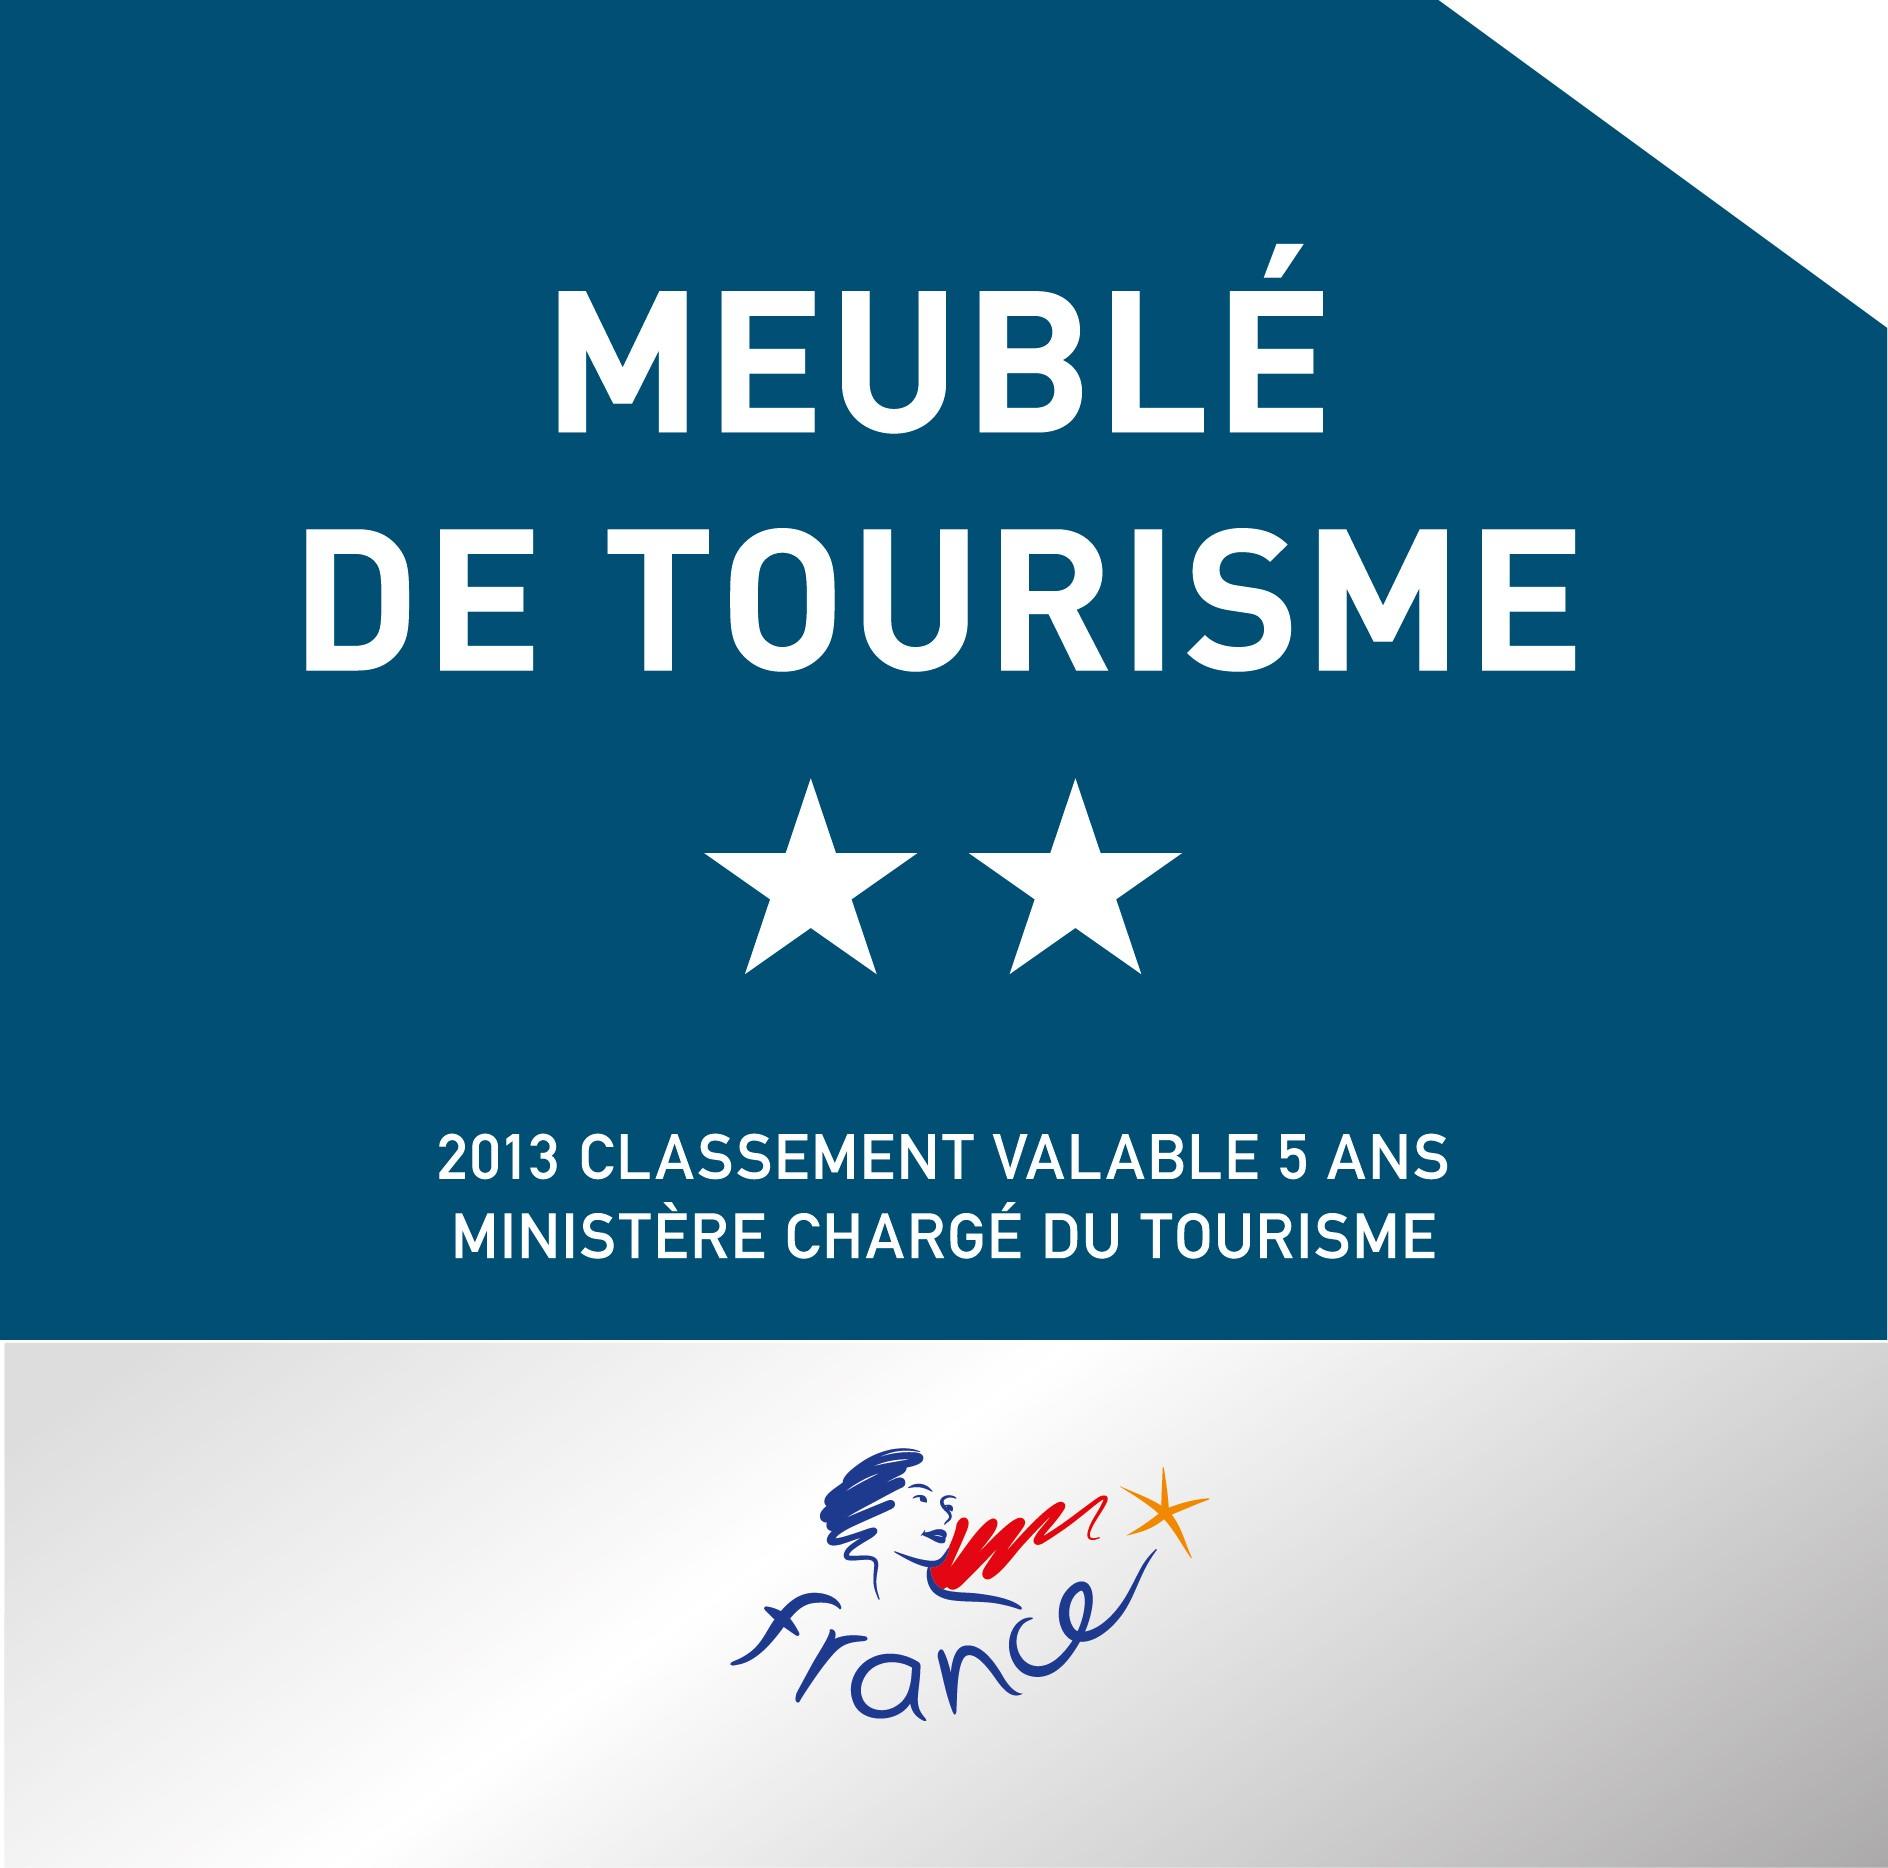 plaque-meuble-tourisme2-13-11630